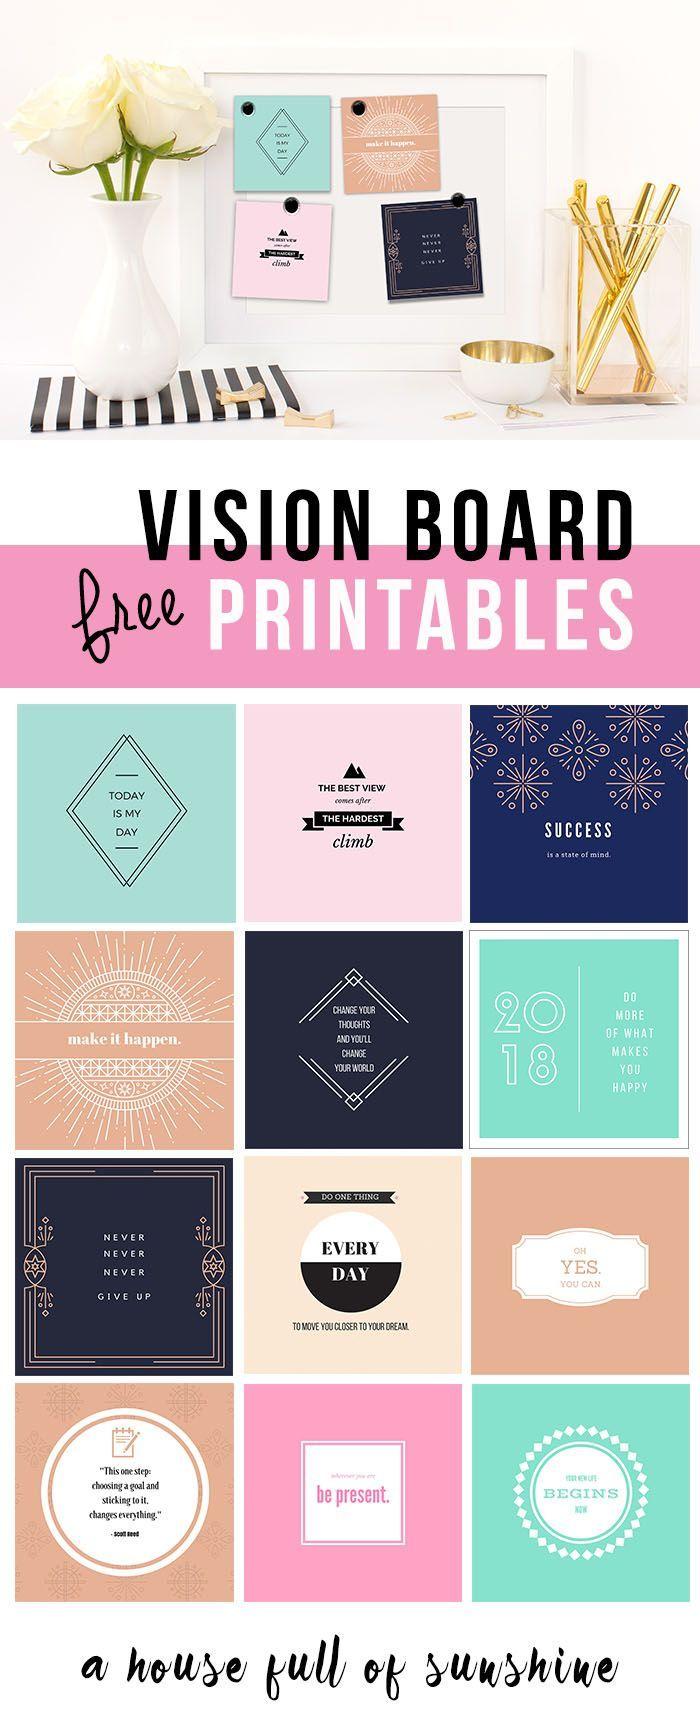 FREE 2018 Vision Board printables!